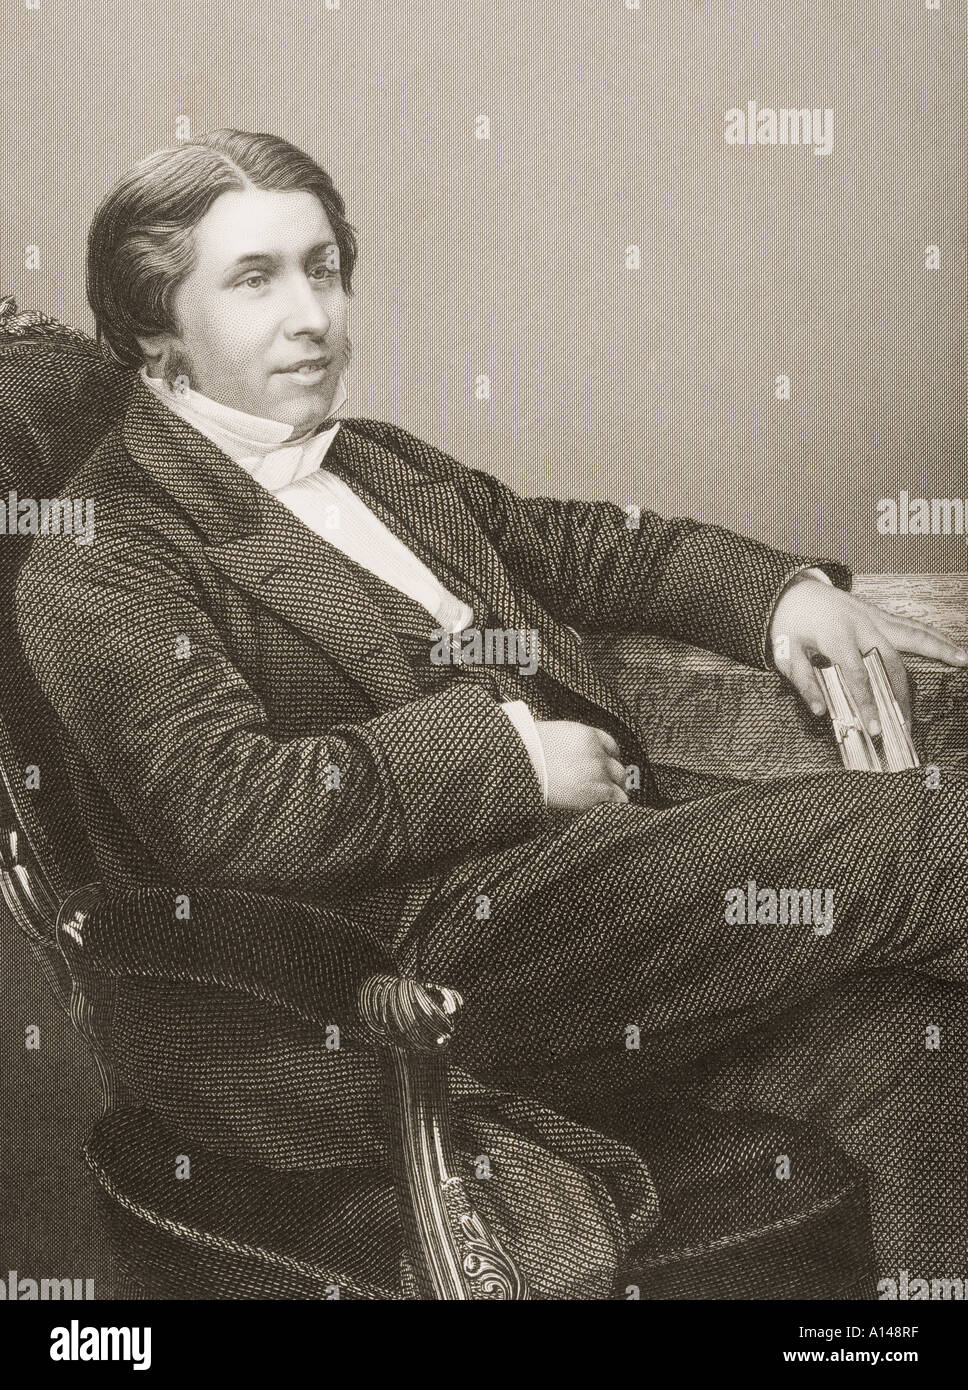 Charles Haddon Spurgeon commonly C H Spurgeon 1834 1892 British Baptist preacher - Stock Image